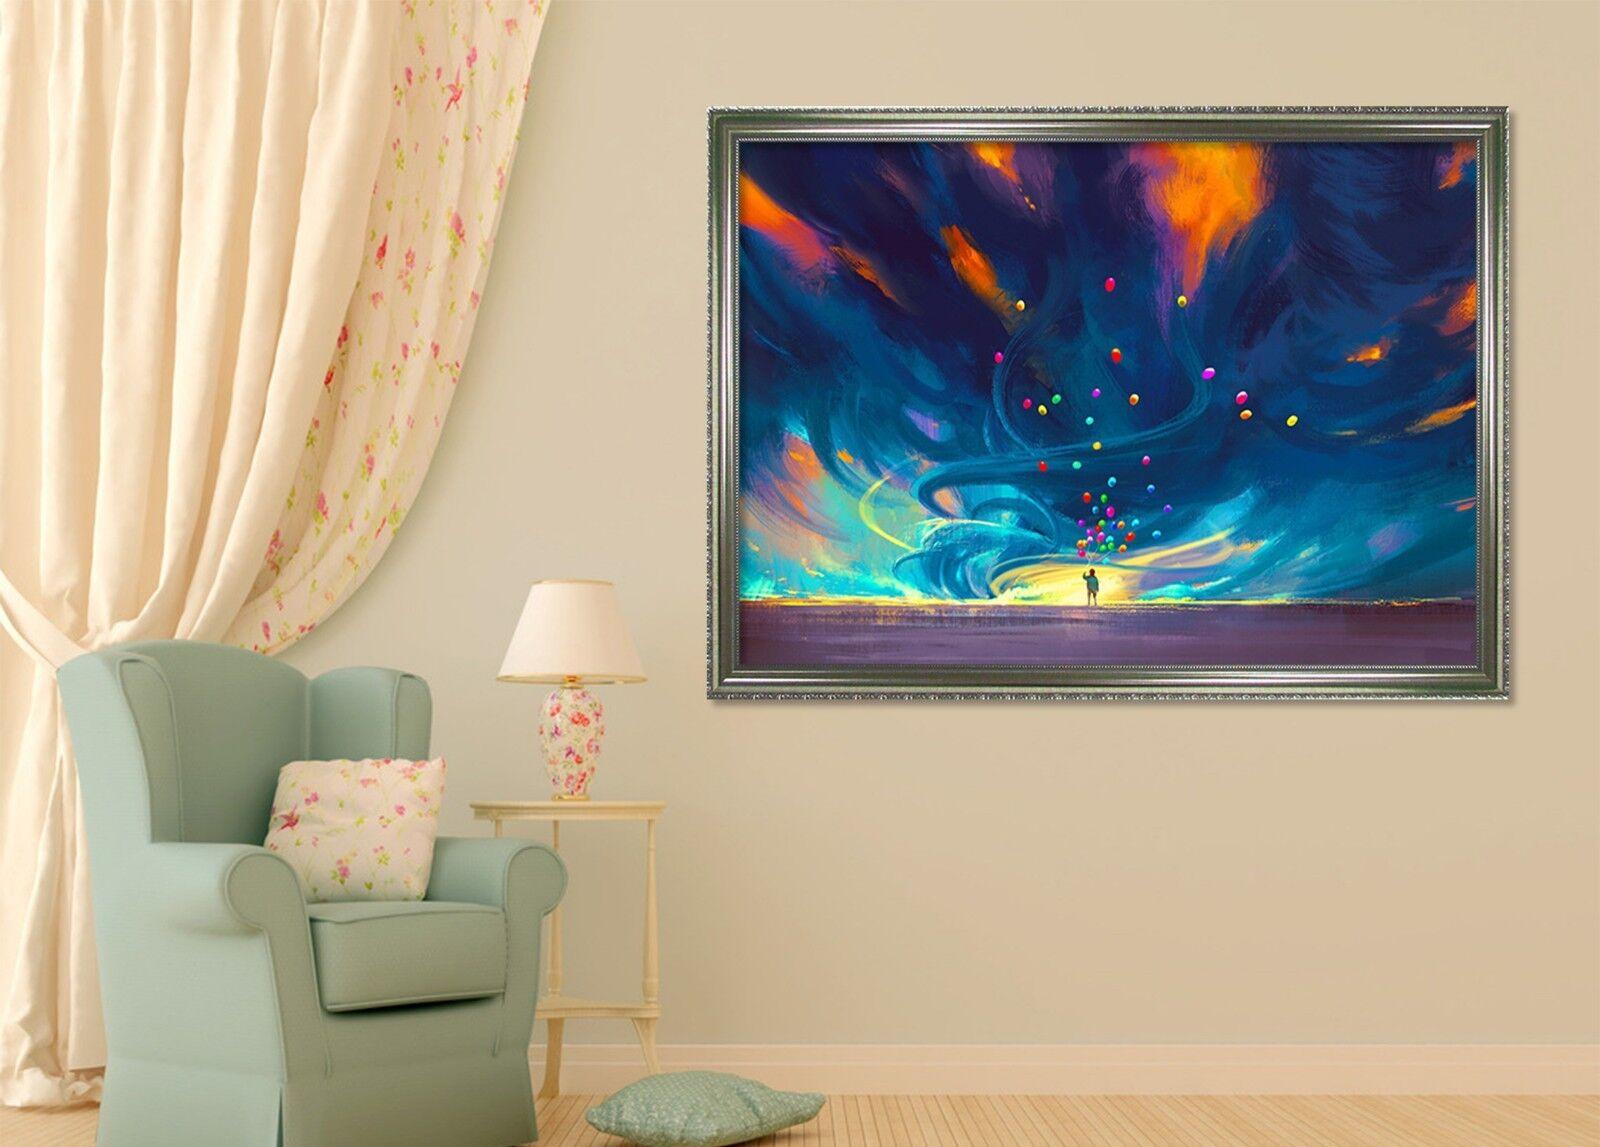 3D Starry Sky 6 Framed Poster Home Decor Print Painting Art AJ WALLPAPER AU